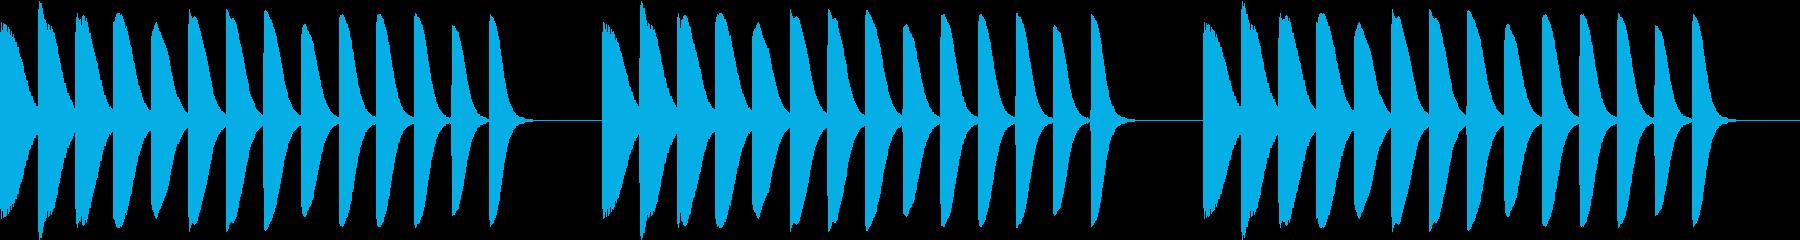 Game 懐かし昭和ゲーム台 リーチ音1の再生済みの波形